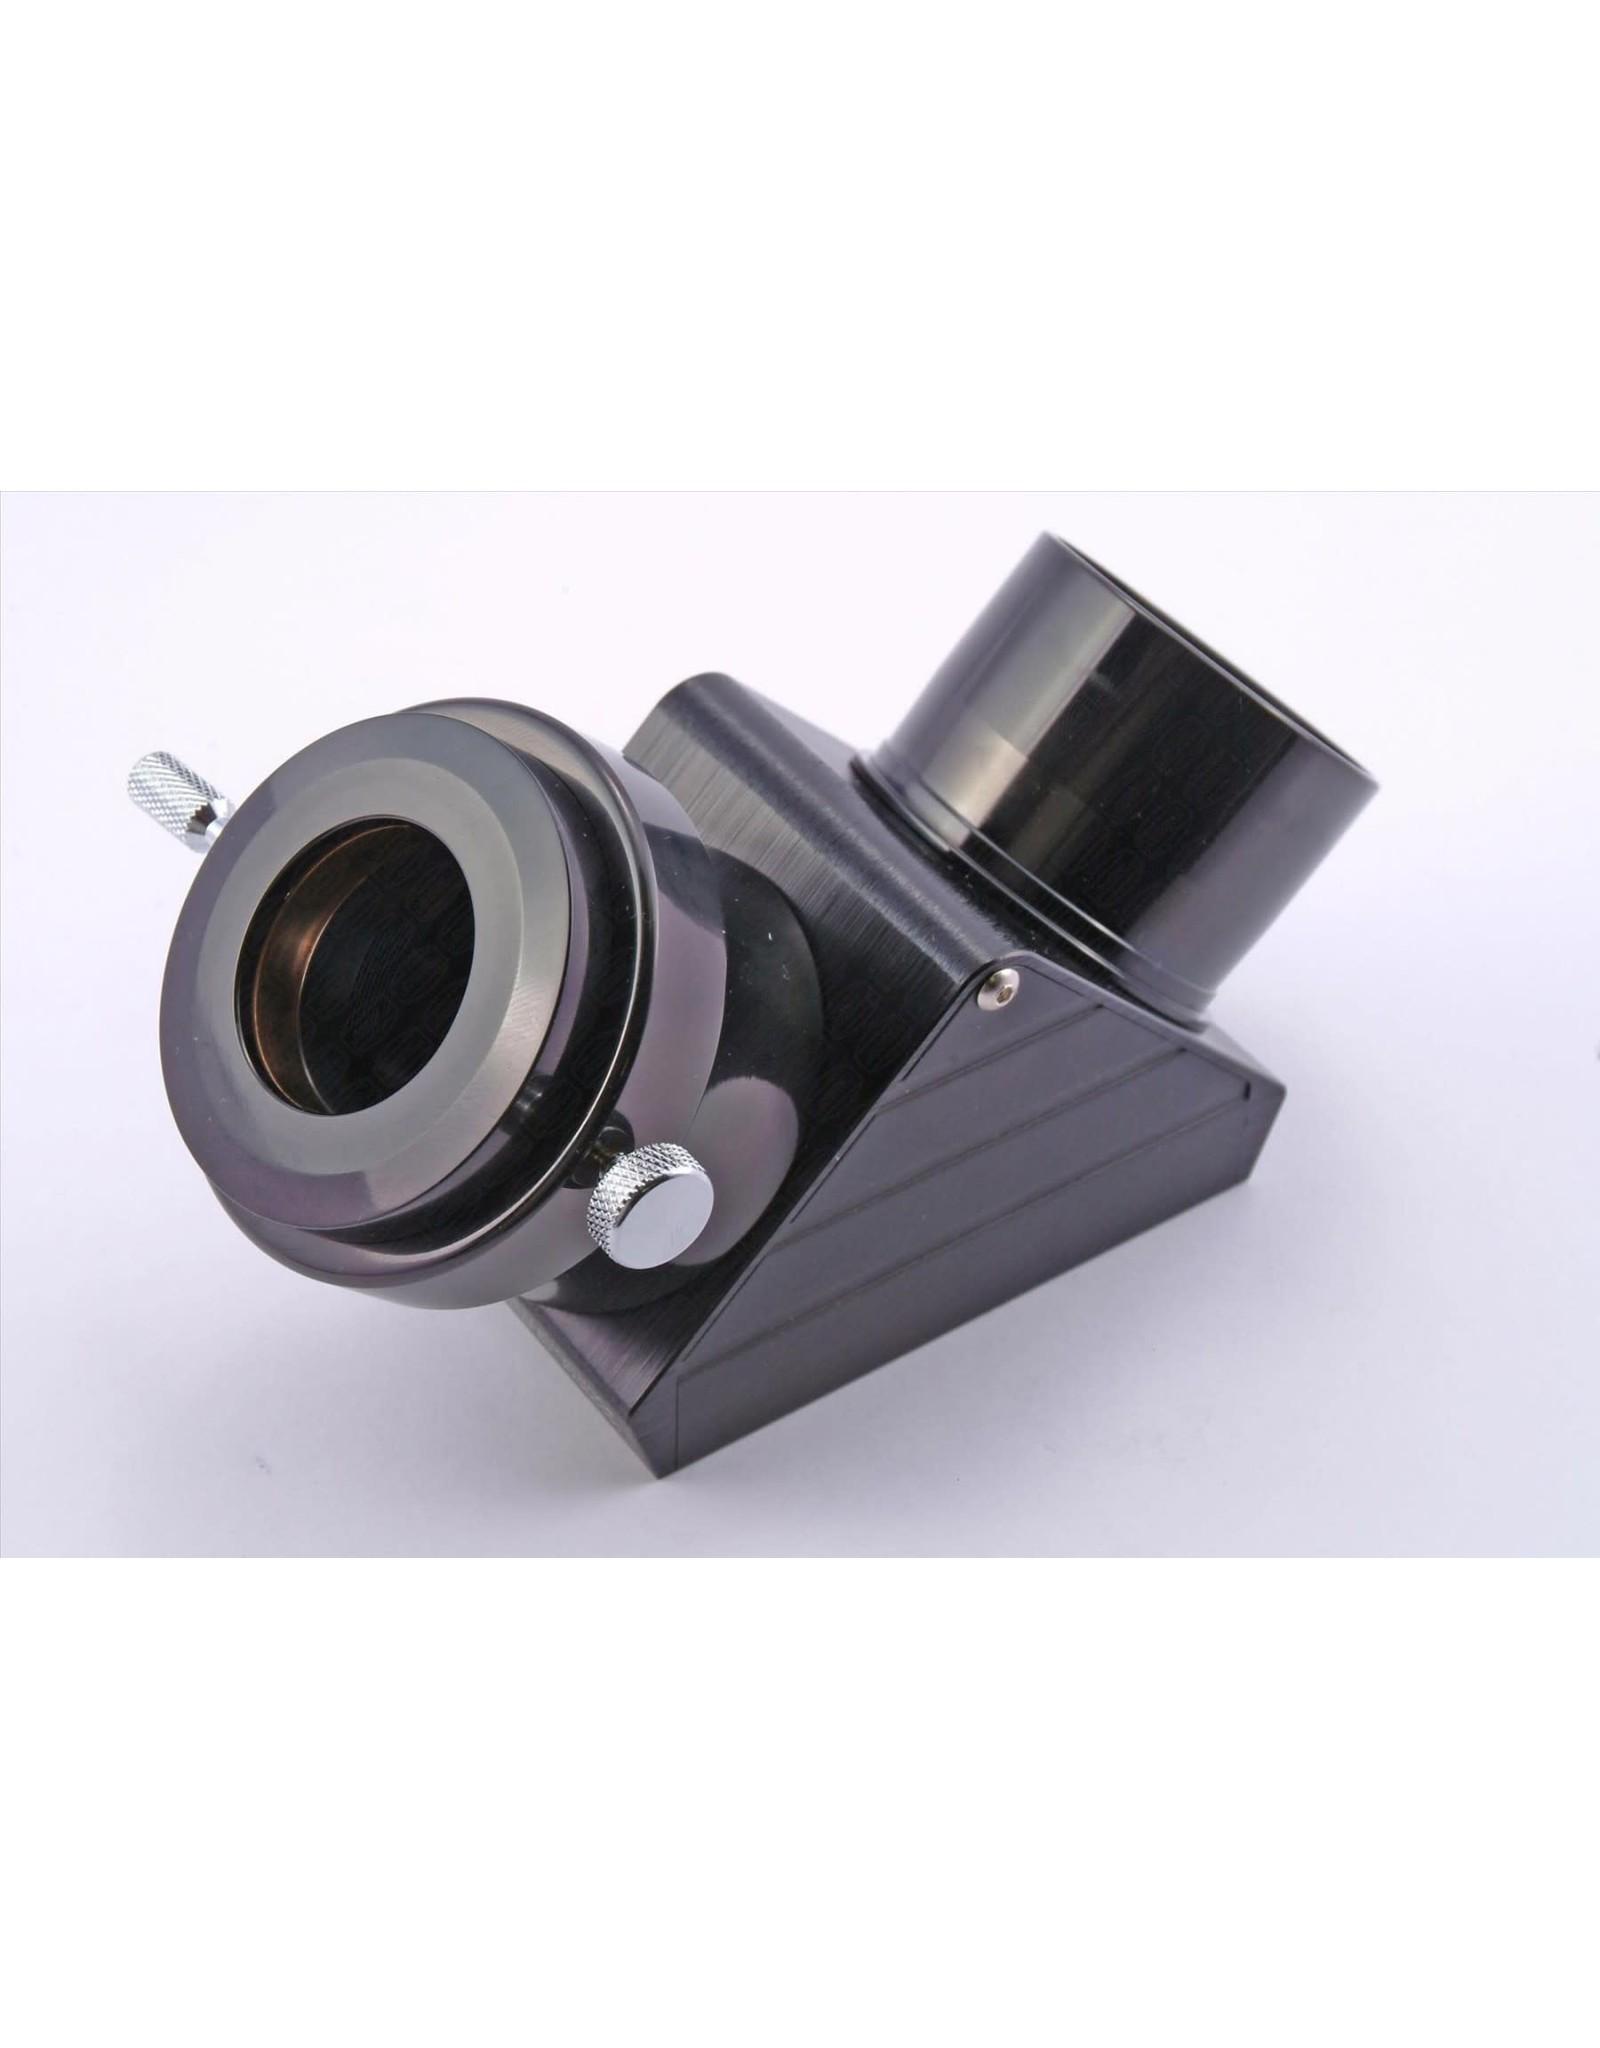 "Baader Planetarium Baader 2"" 90-Degree Erecting Amici Prism Diagonal with 1.25"" Adapter"